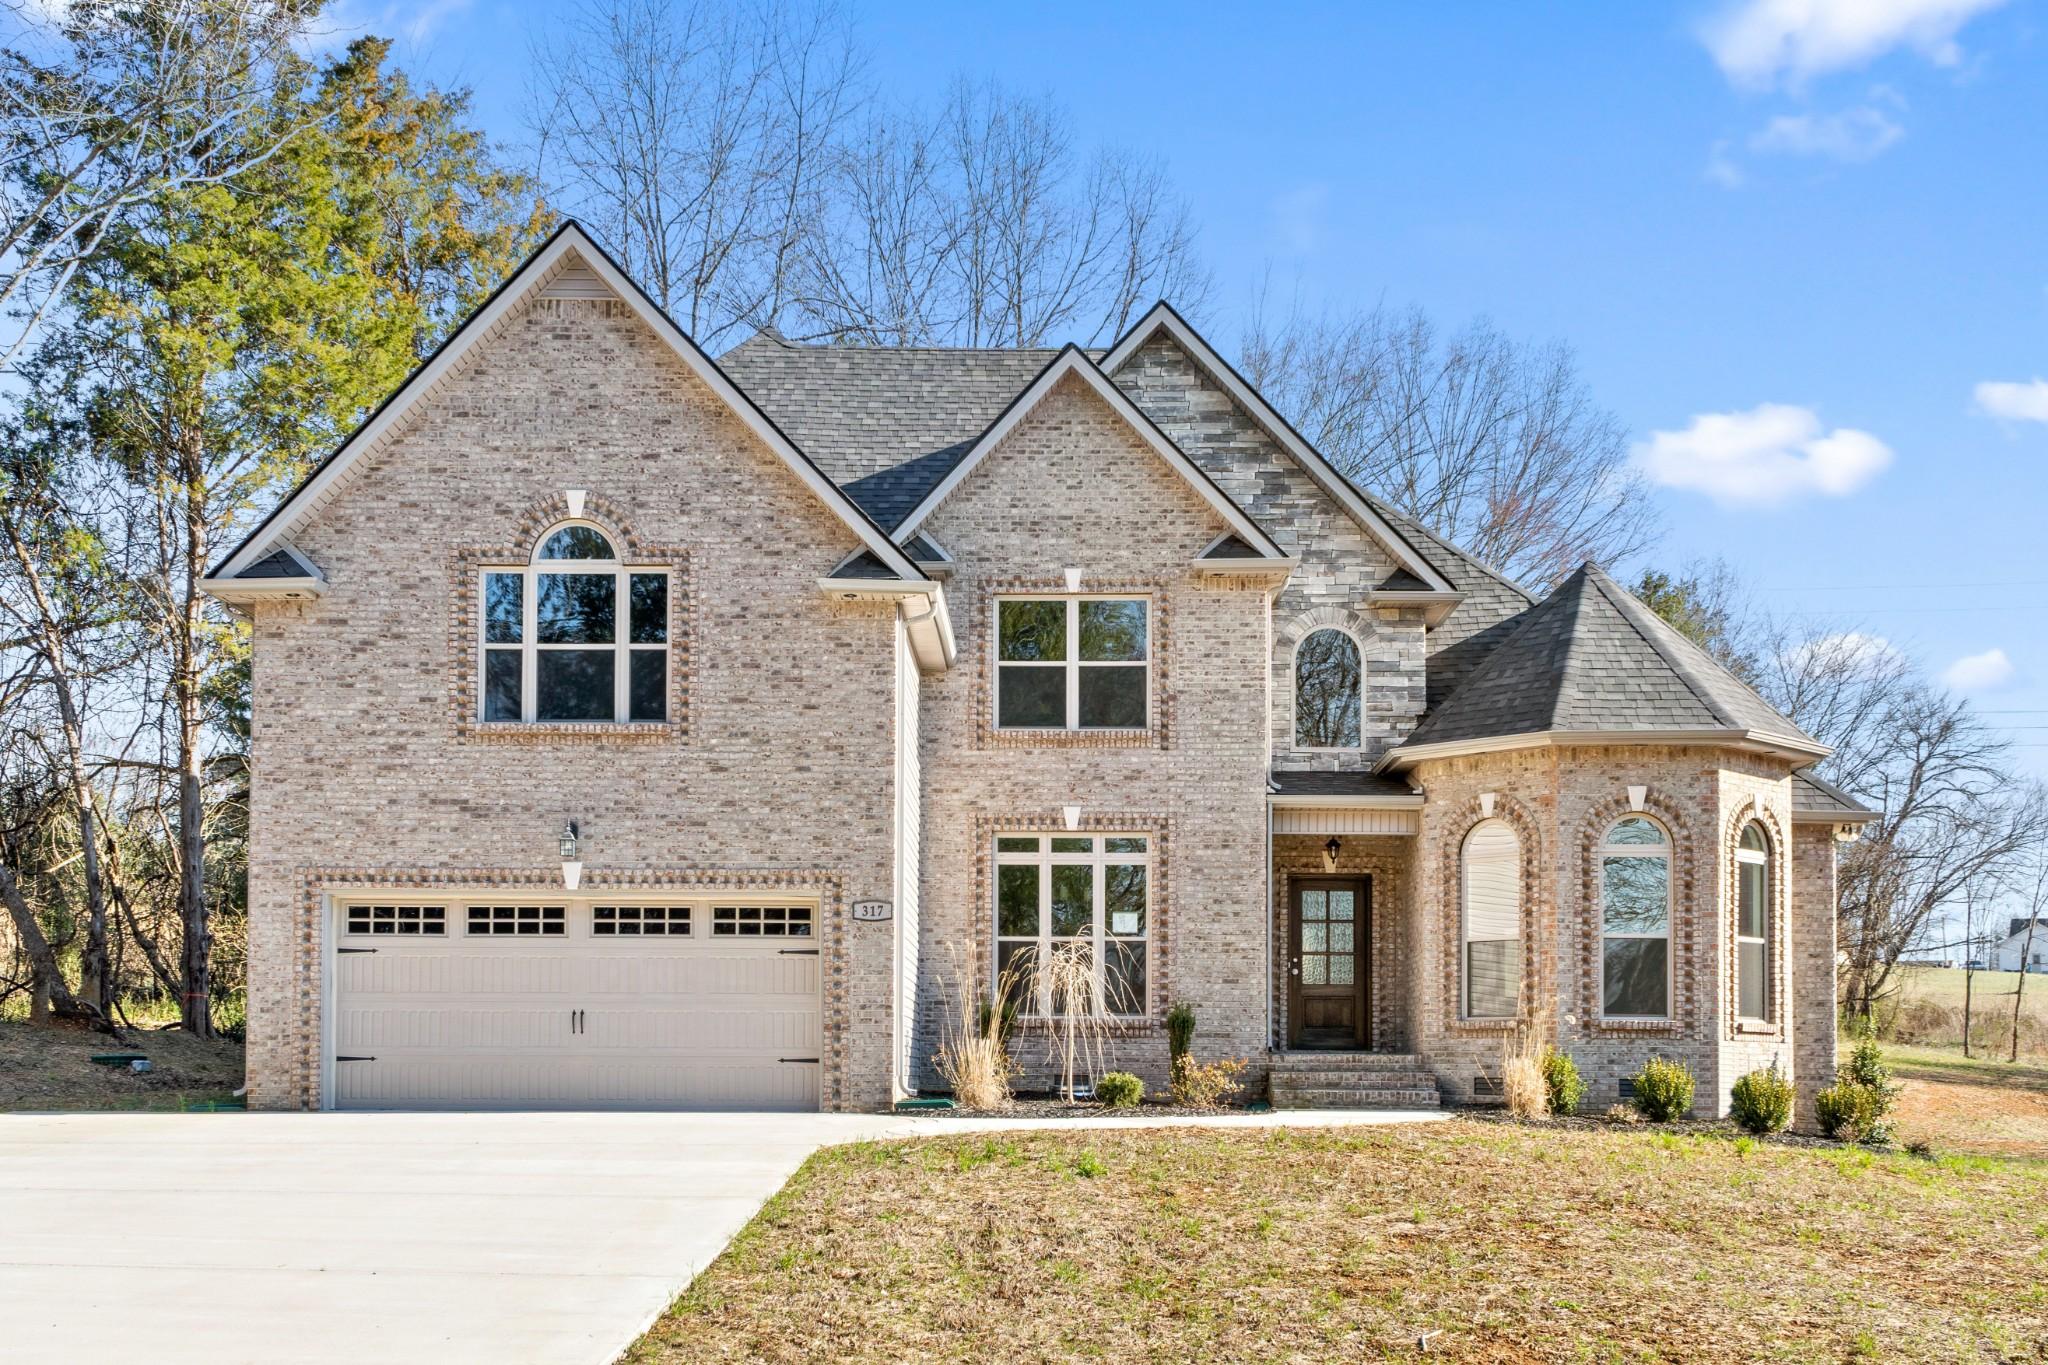 211 Autumnwood Property Photo - Clarksville, TN real estate listing